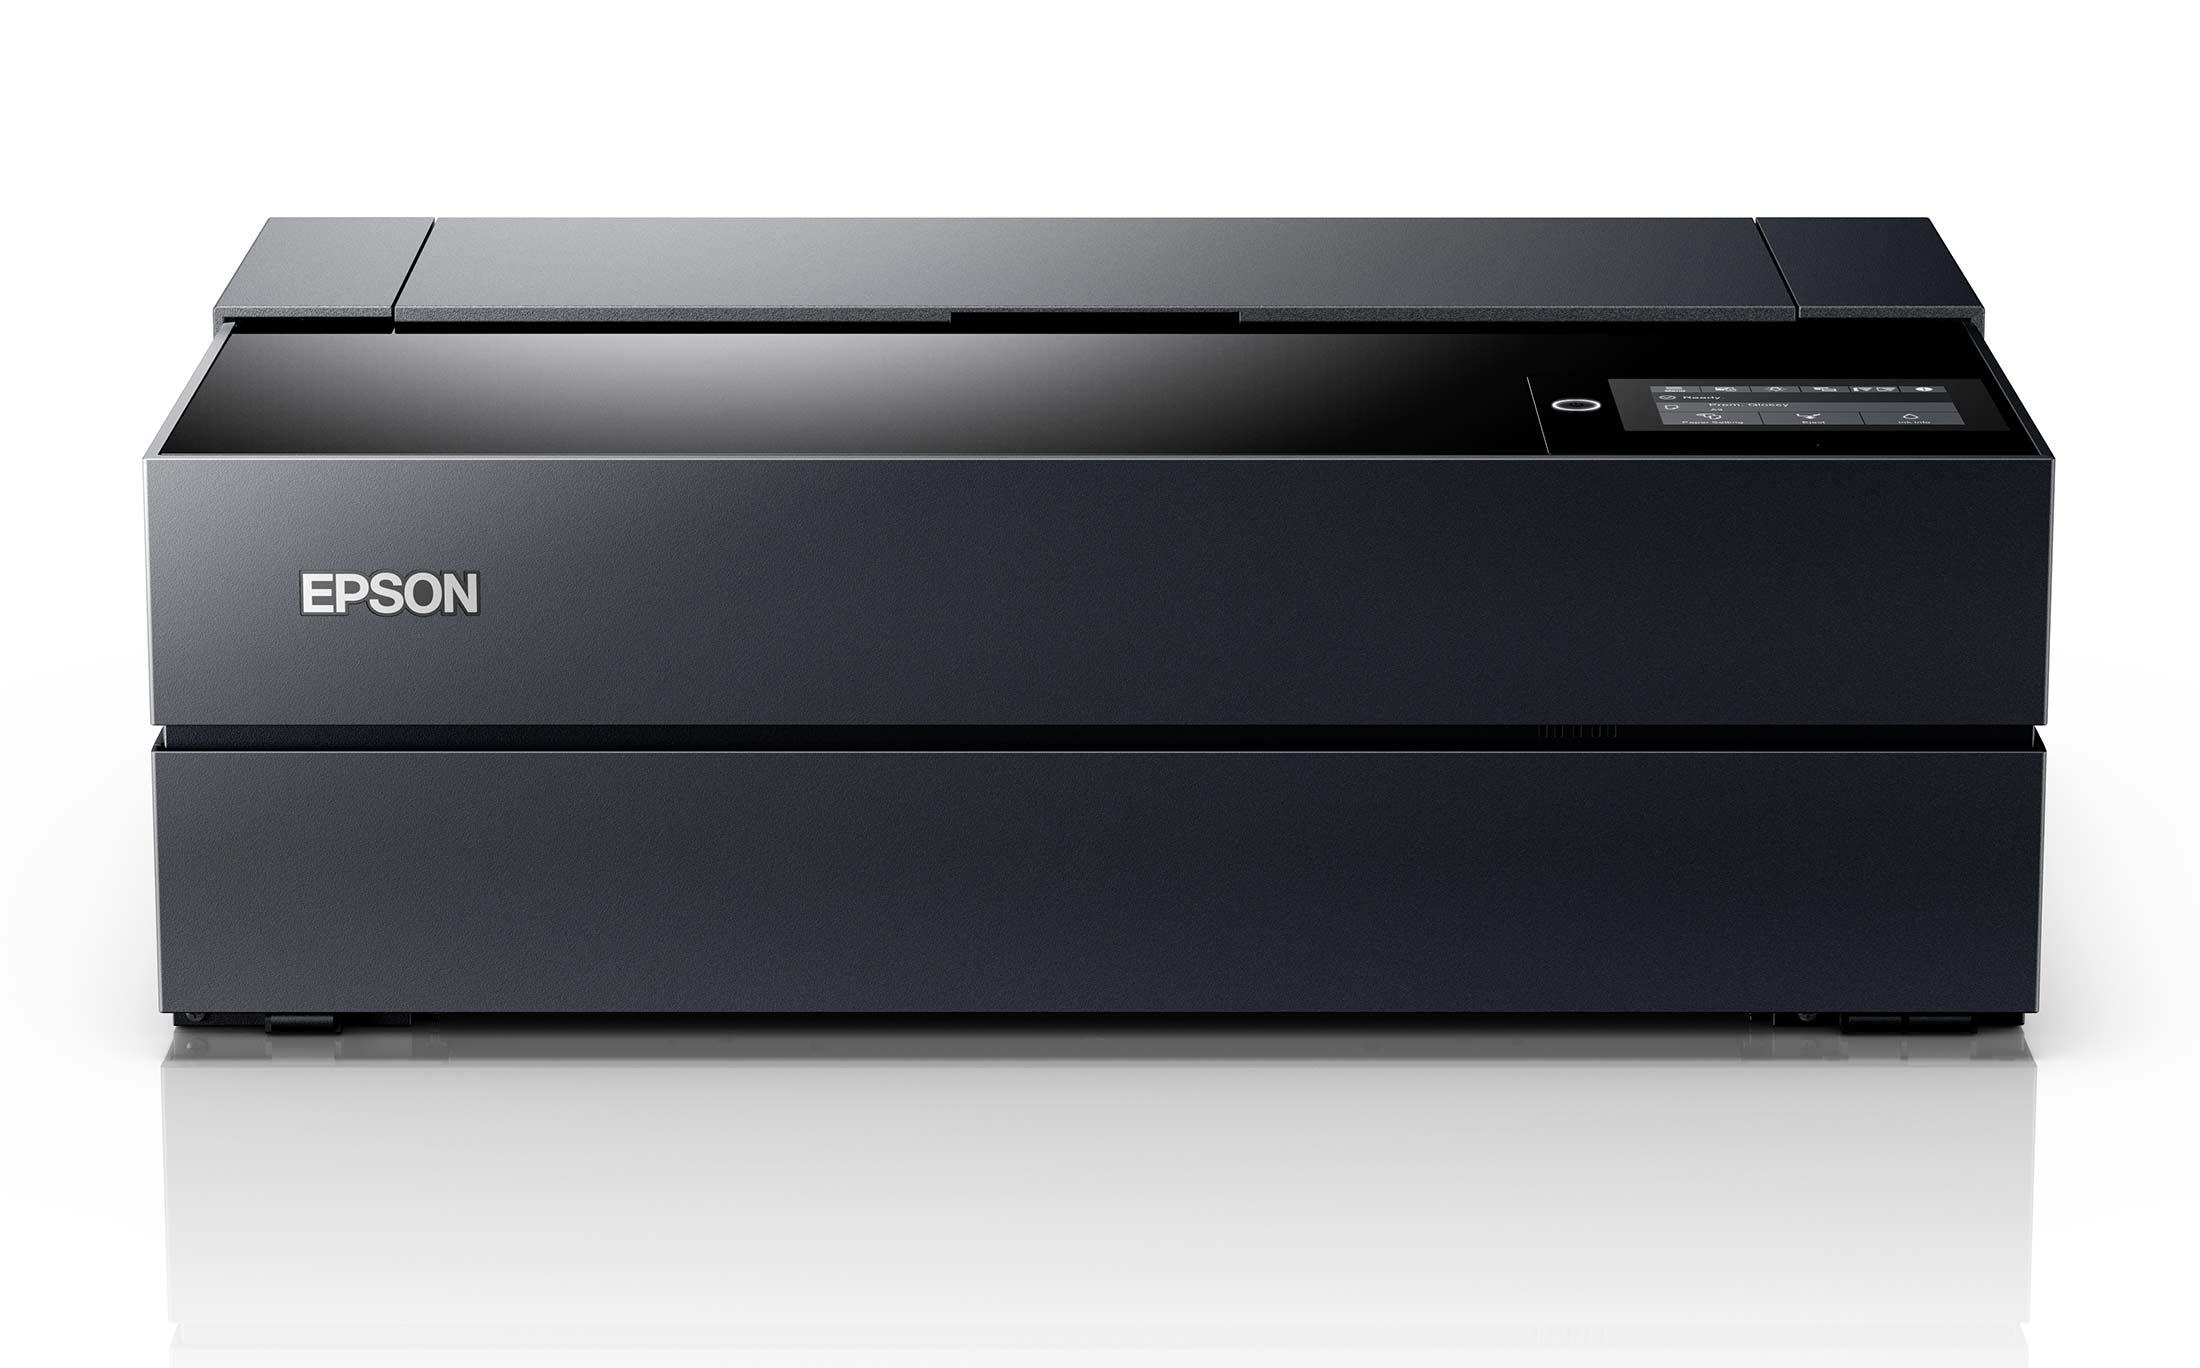 Epson-p900